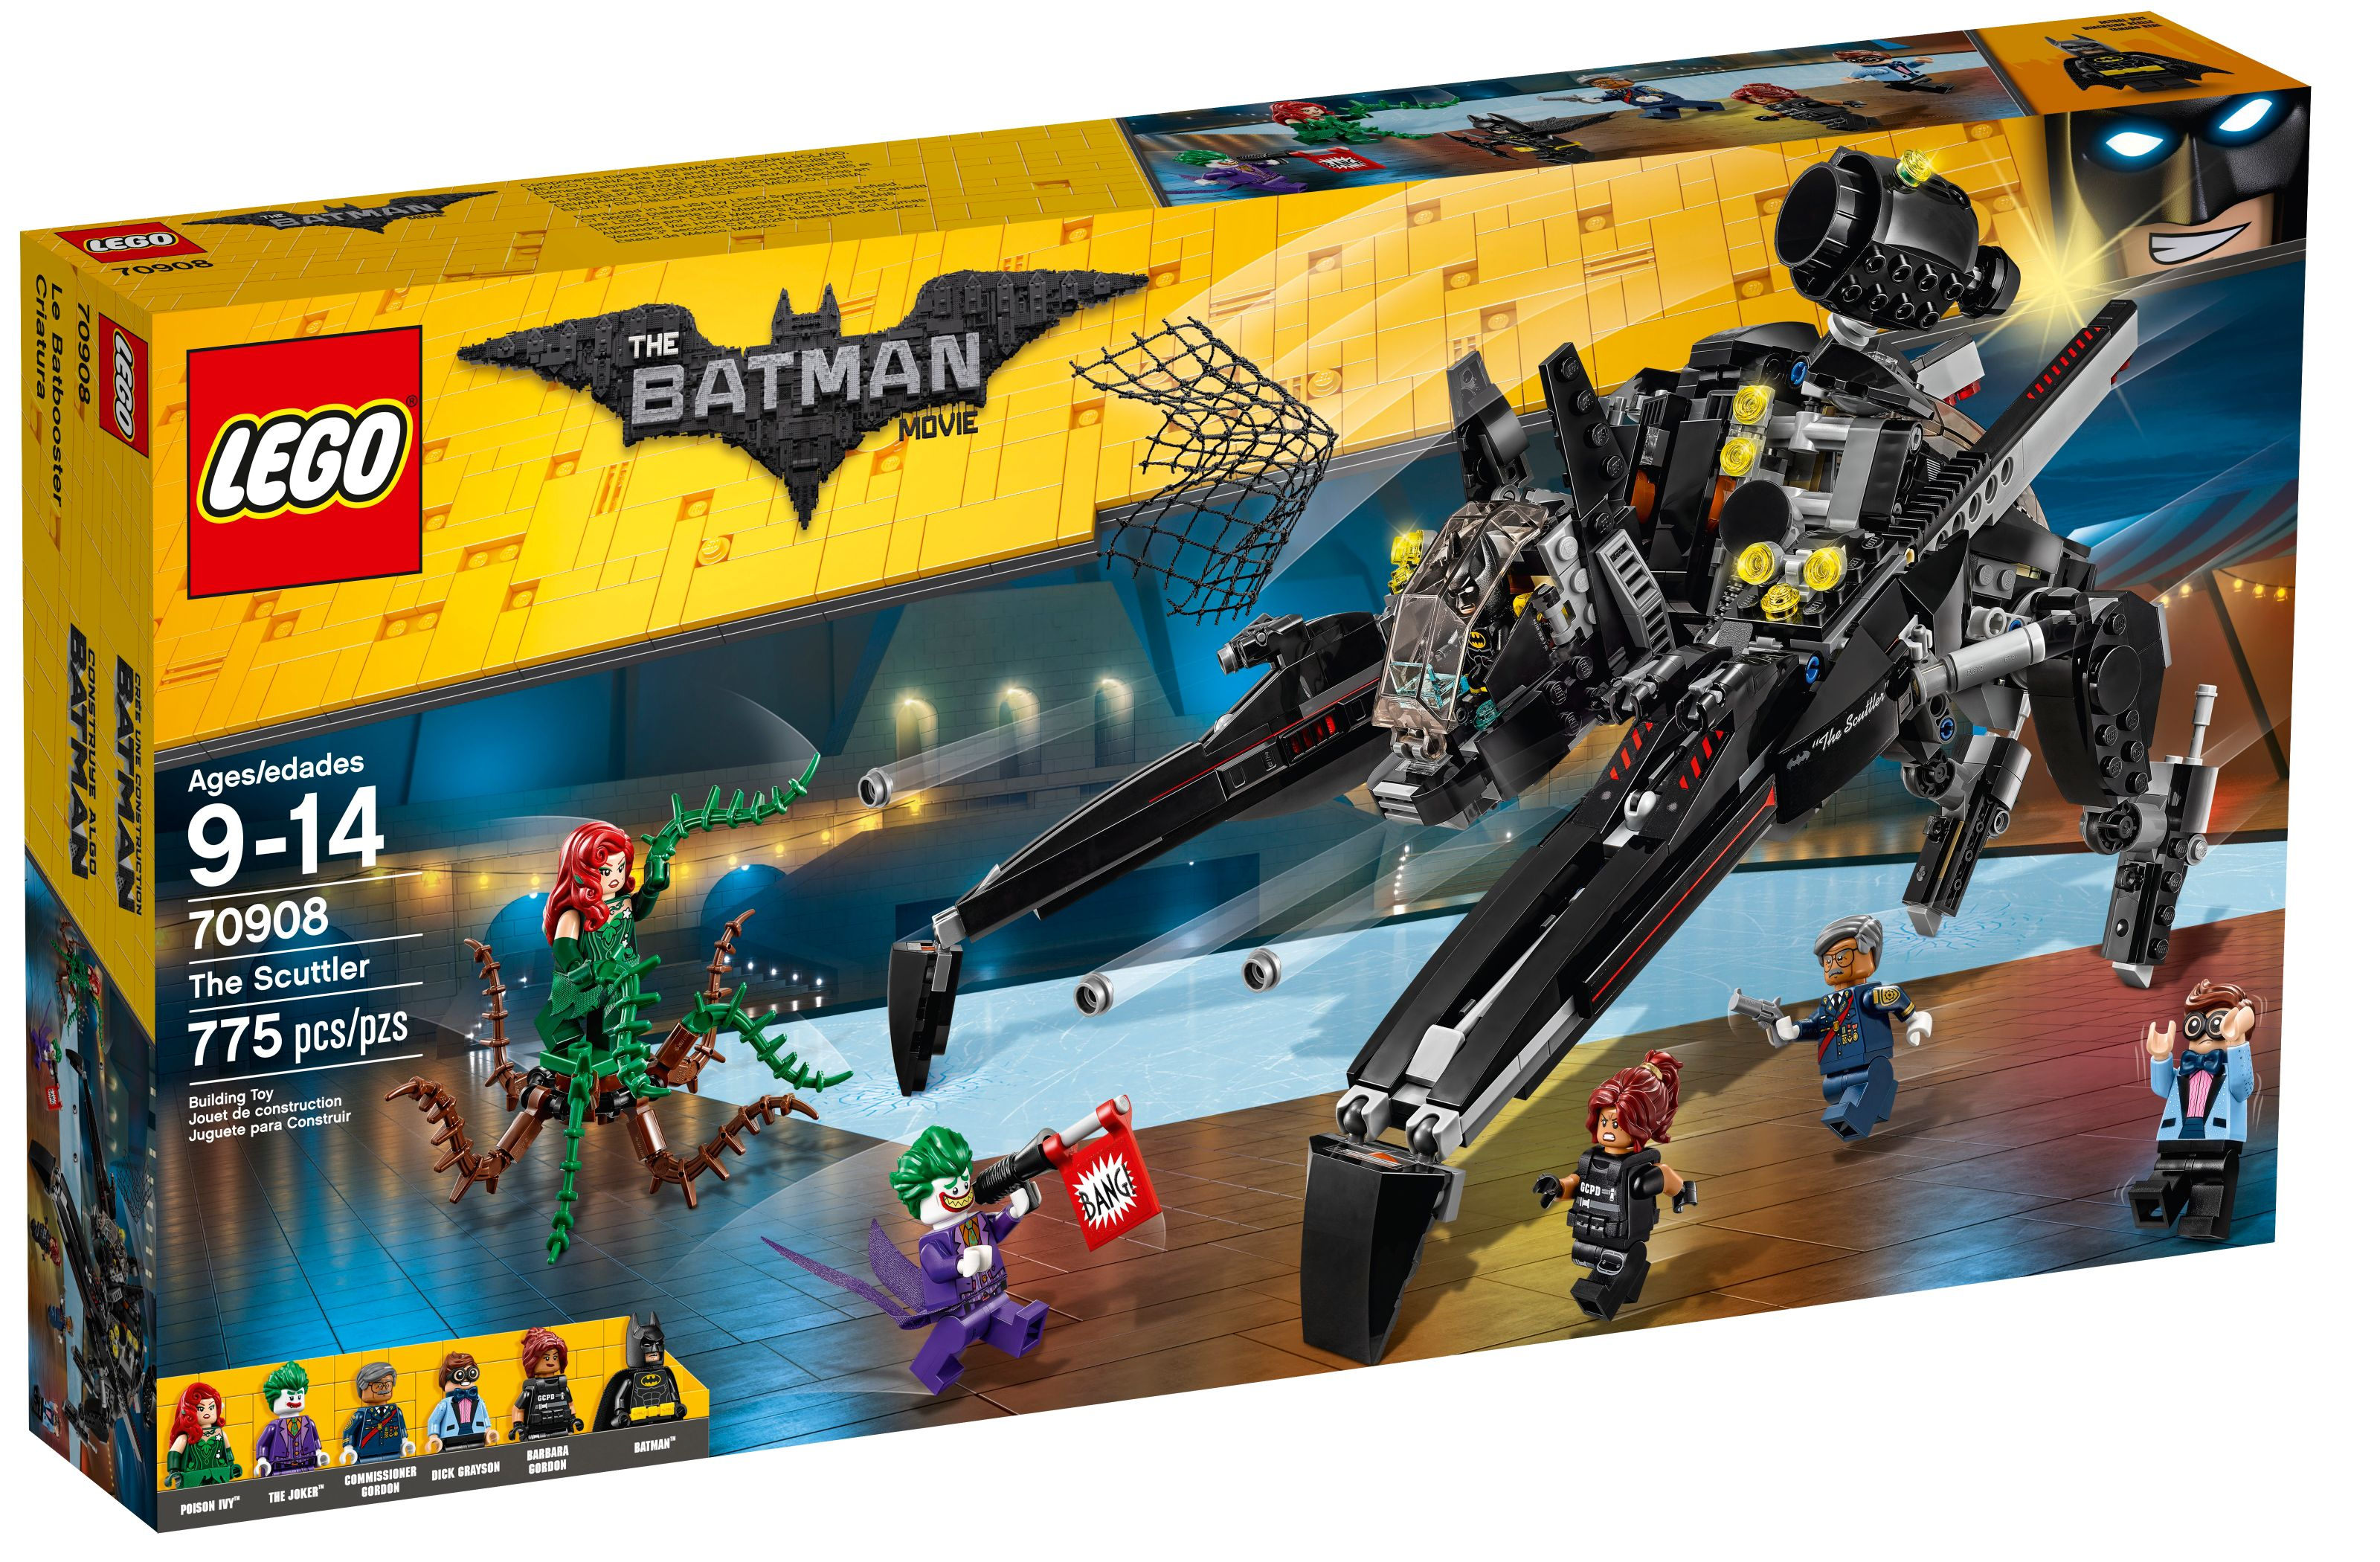 The LEGO Batman Movie Sets On Sale - FBTB